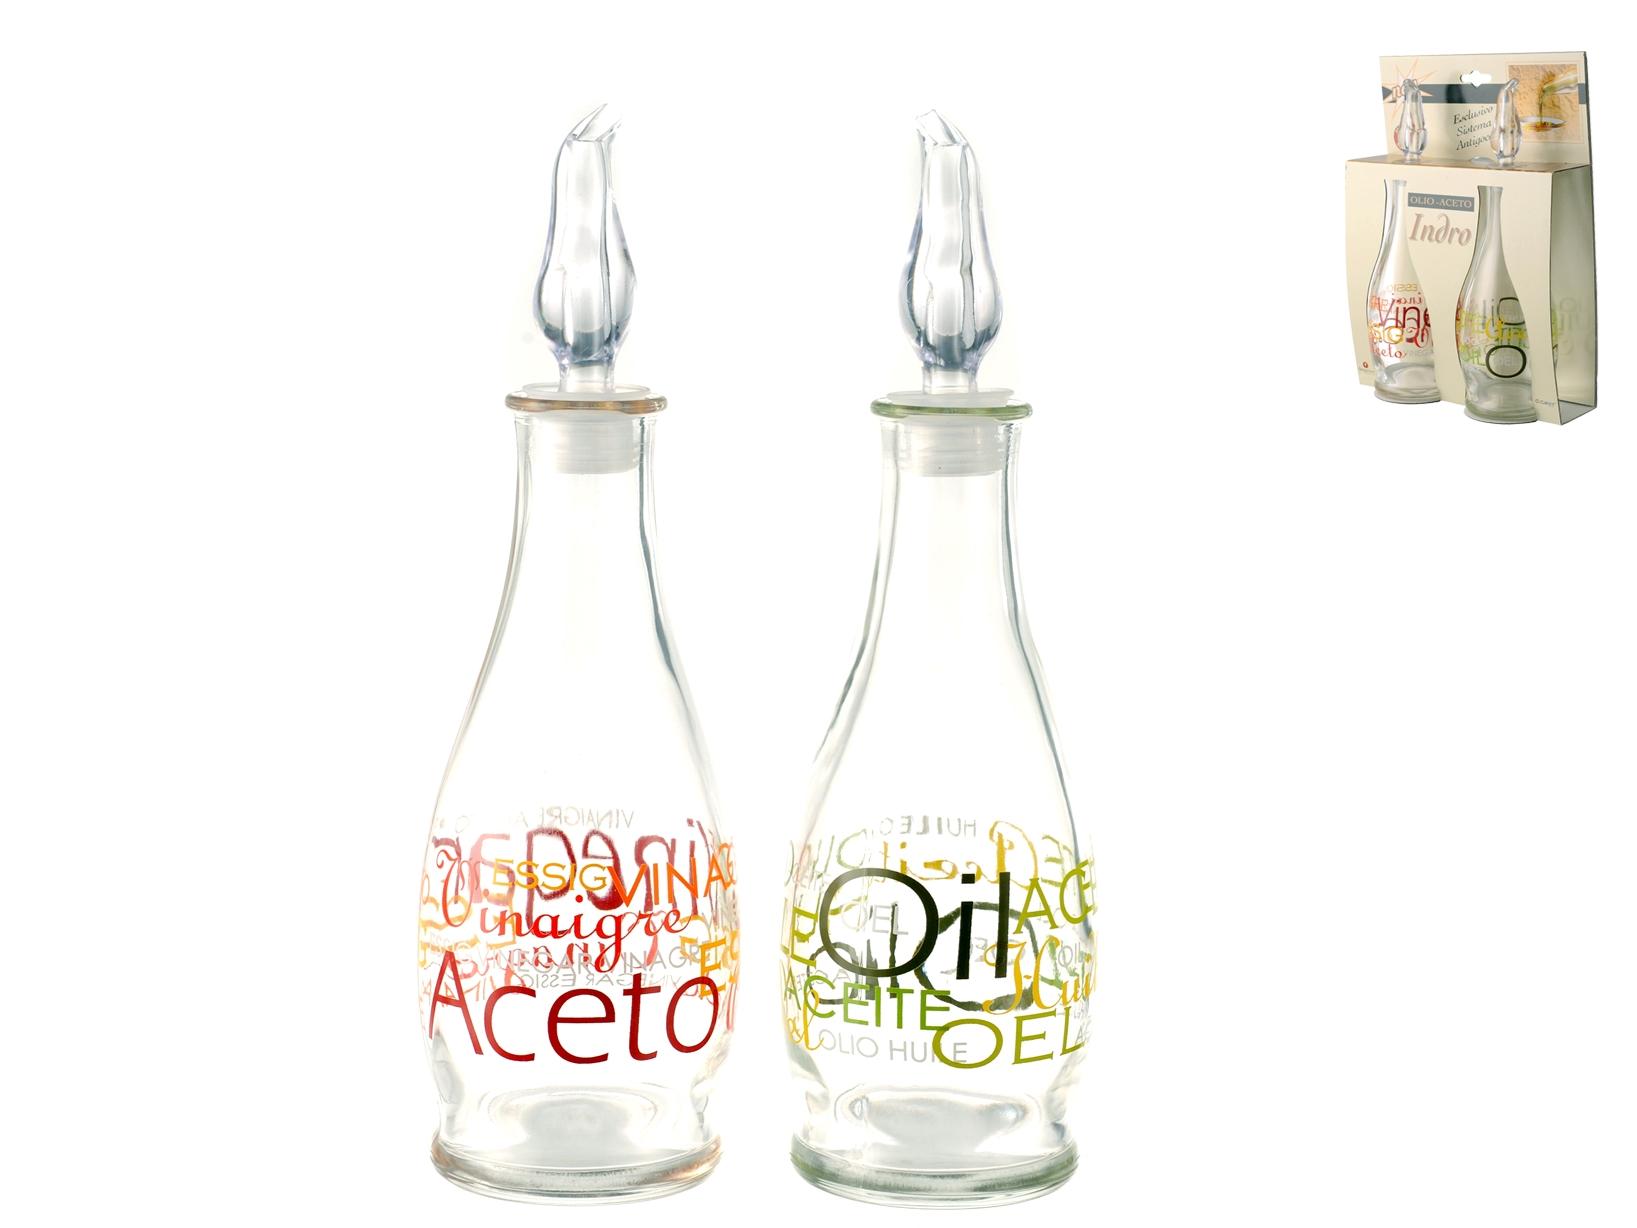 Set Olio-aceto In Vetro Decoro Mix